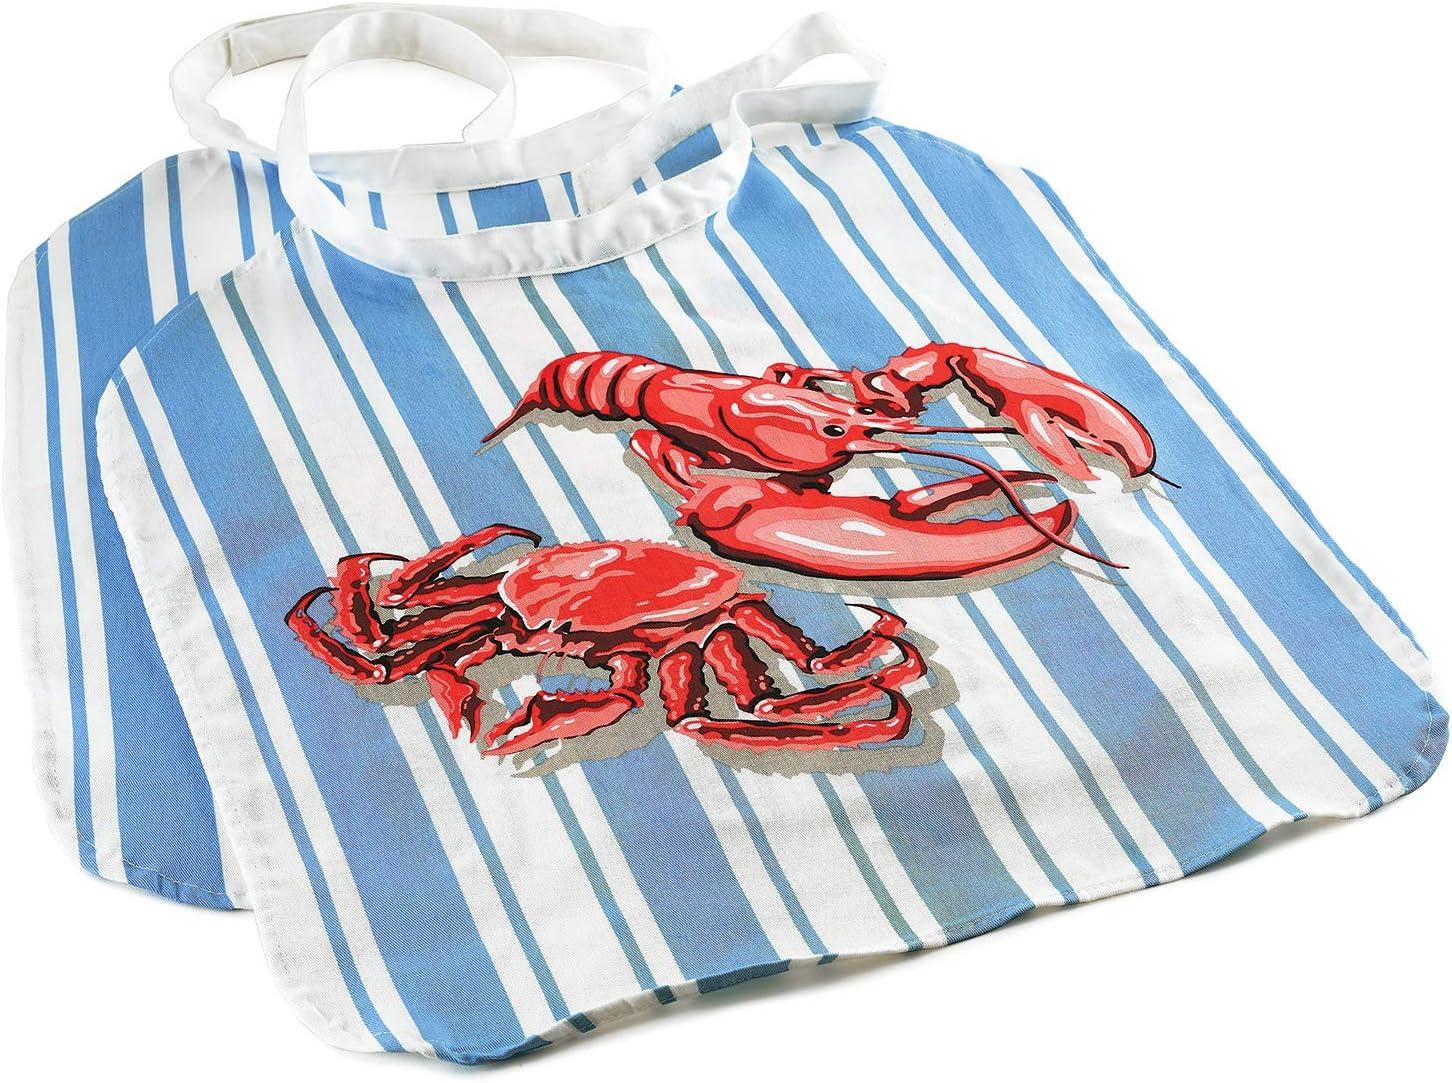 Norpro Cotton Seafood Lobster Bib, Set of 4